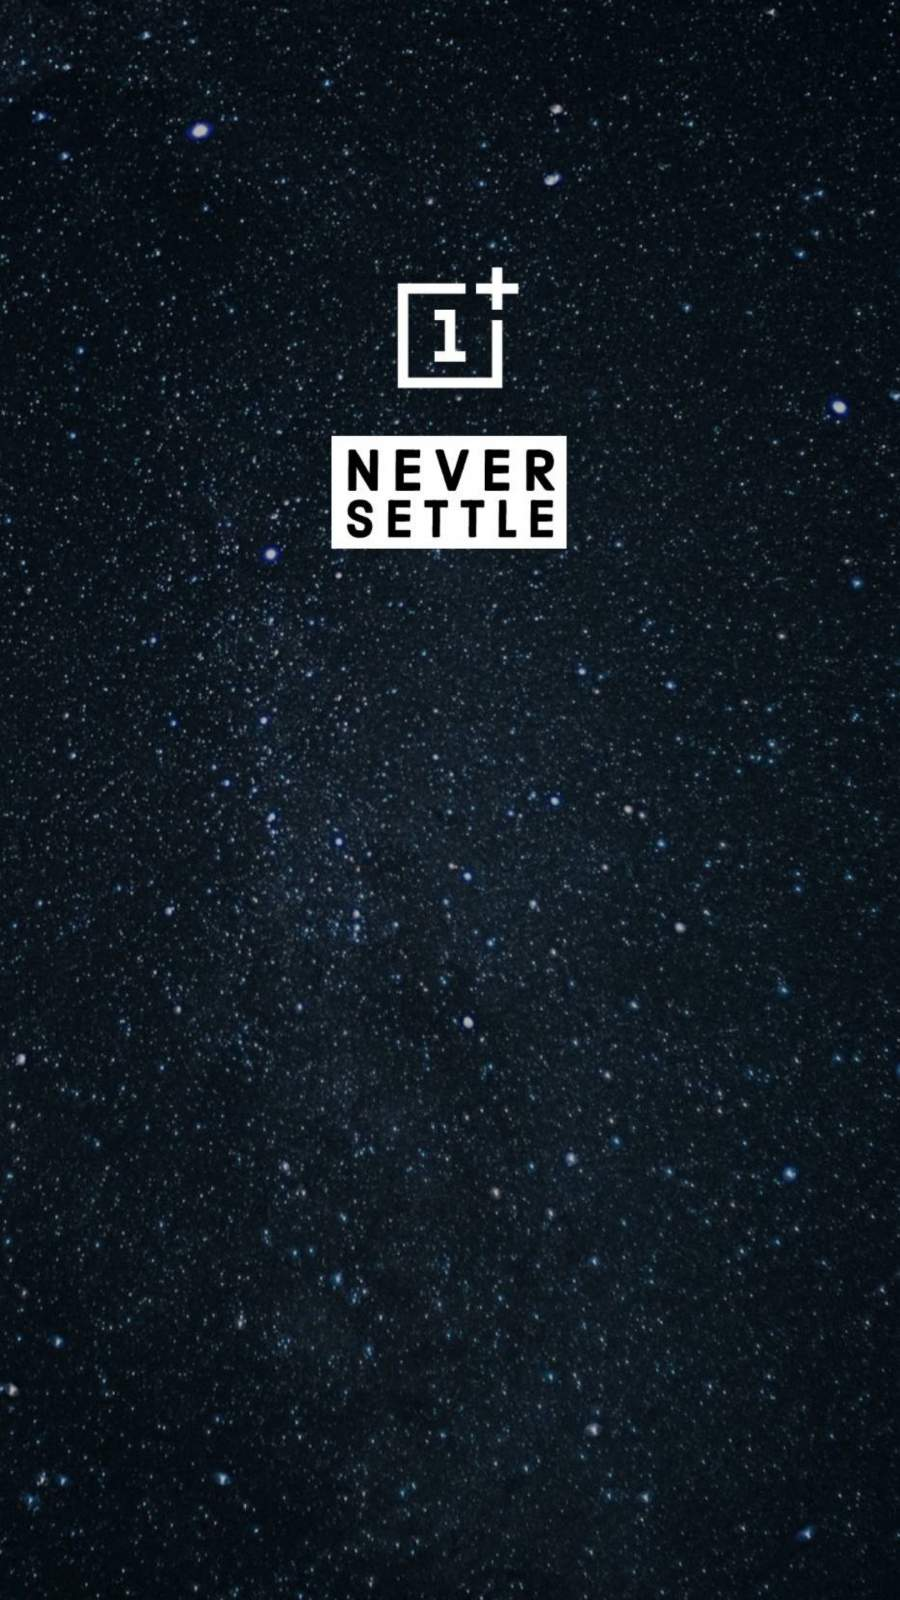 Never Settle iPhone Wallpaper